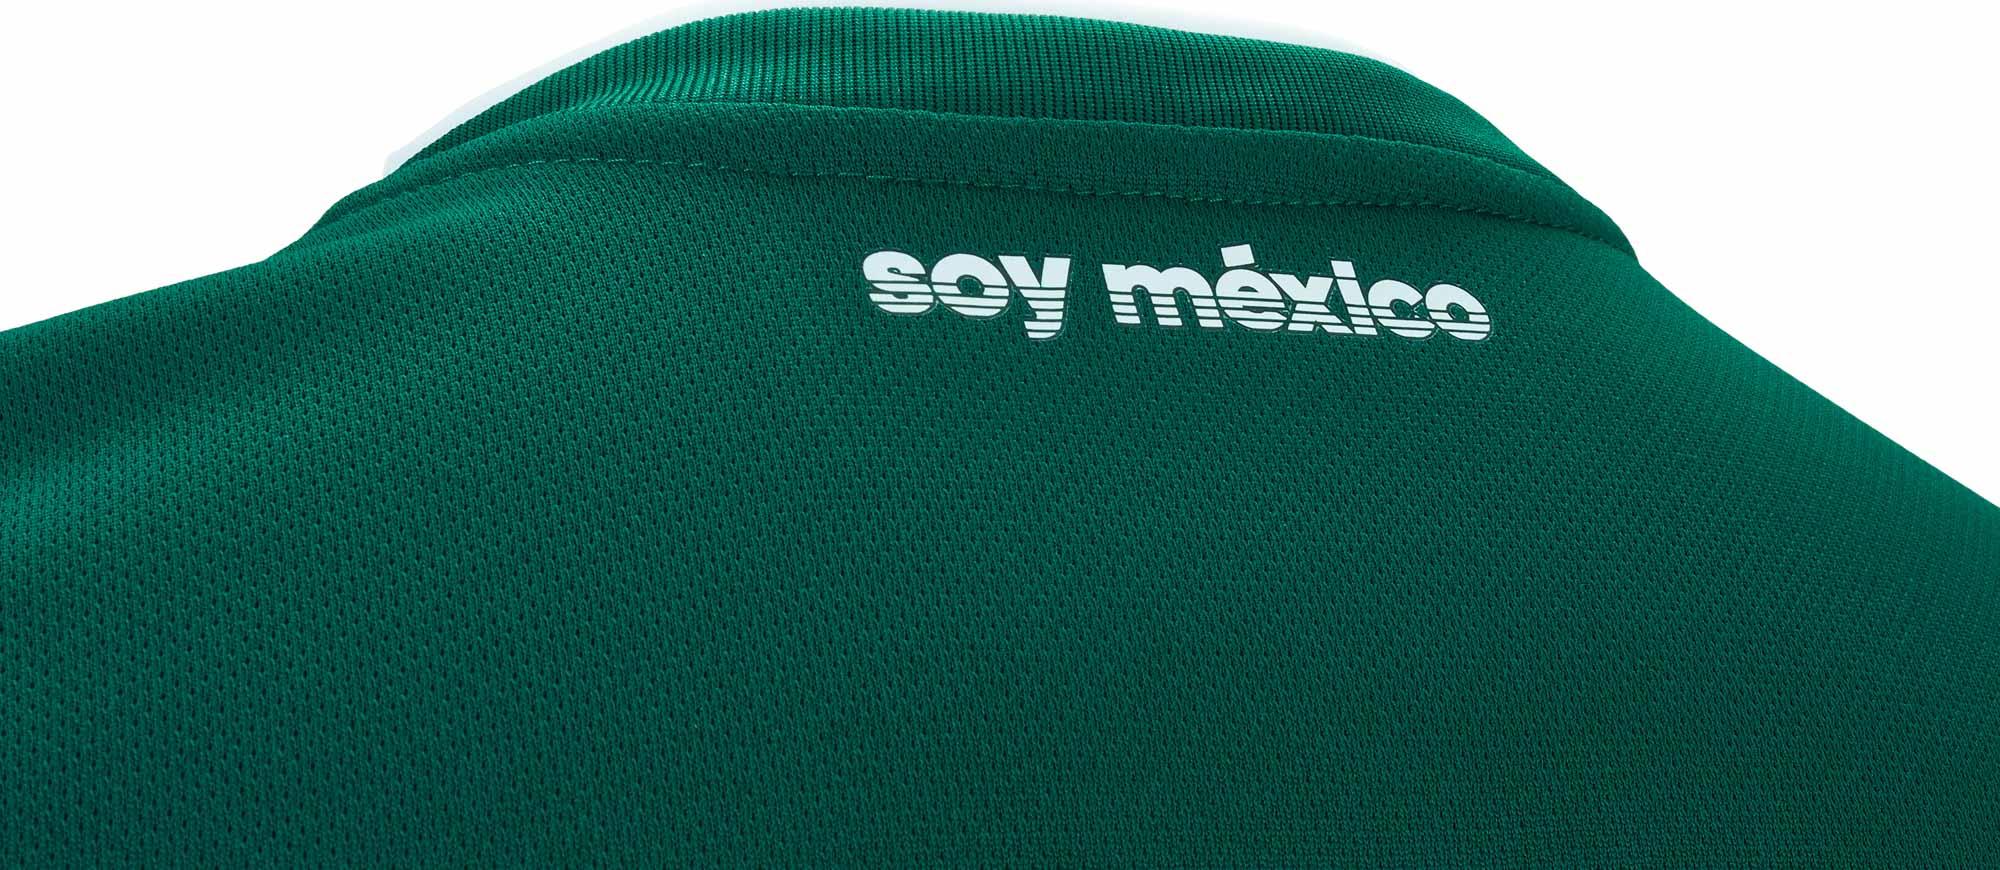 bb4cc268753db adidas Mexico Home Jersey 2018-19 - SoccerPro.com